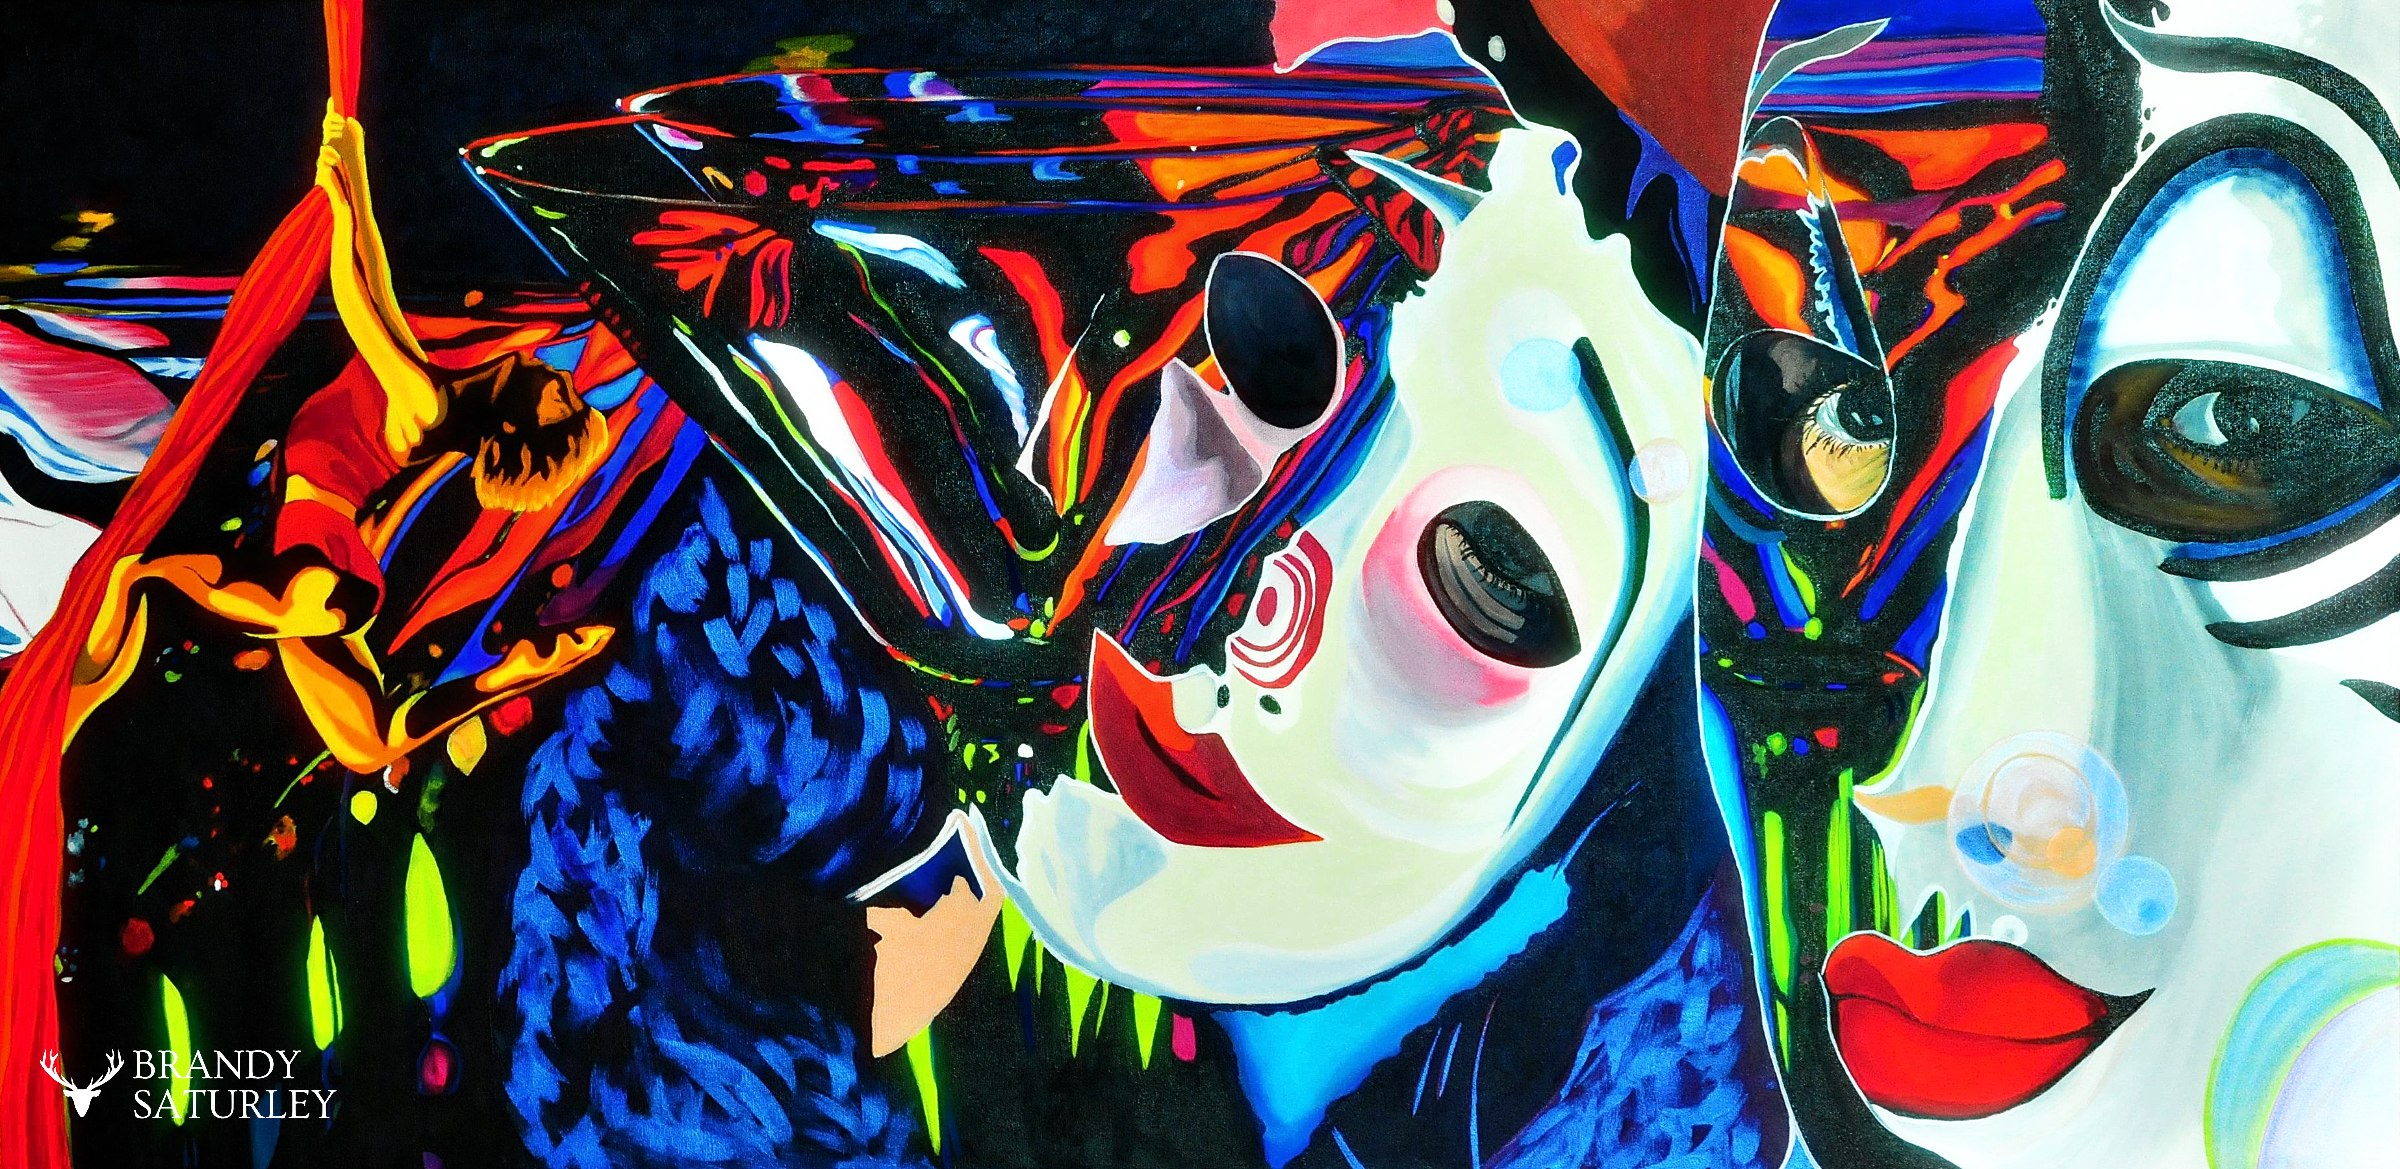 cirque du soleil painting